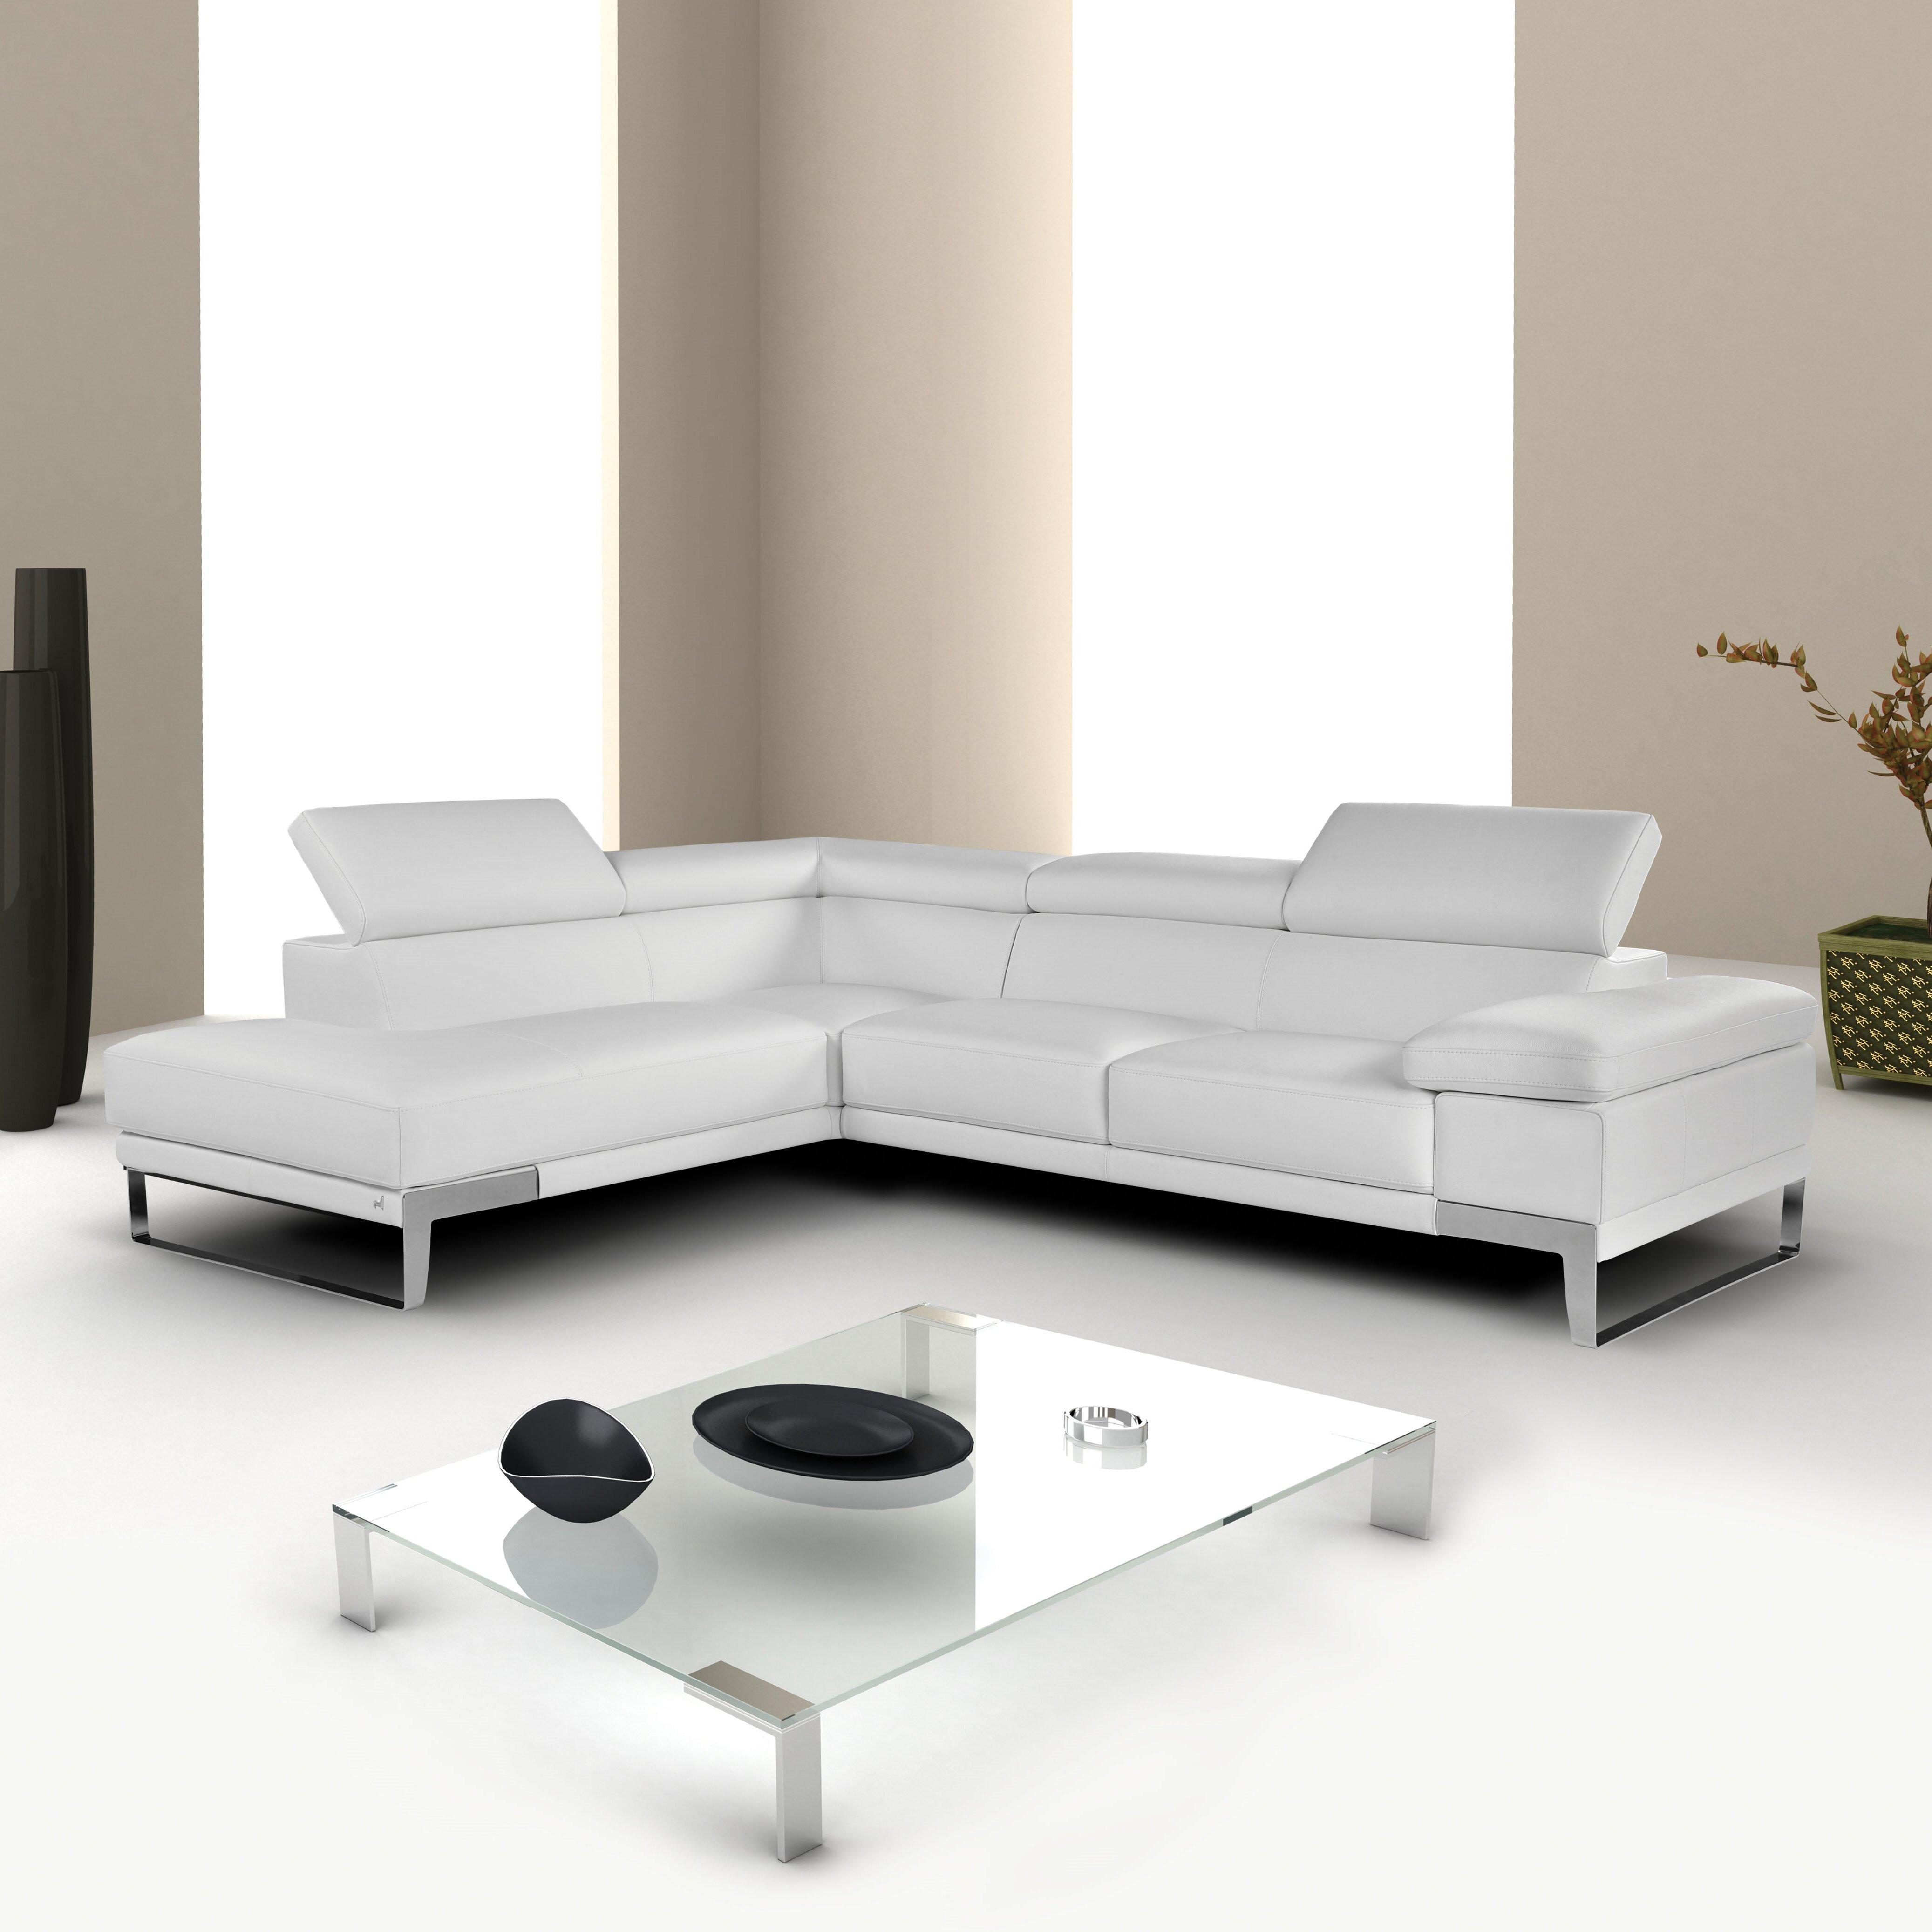 J M Furniture Nicoletti Sectional Reviews Wayfair